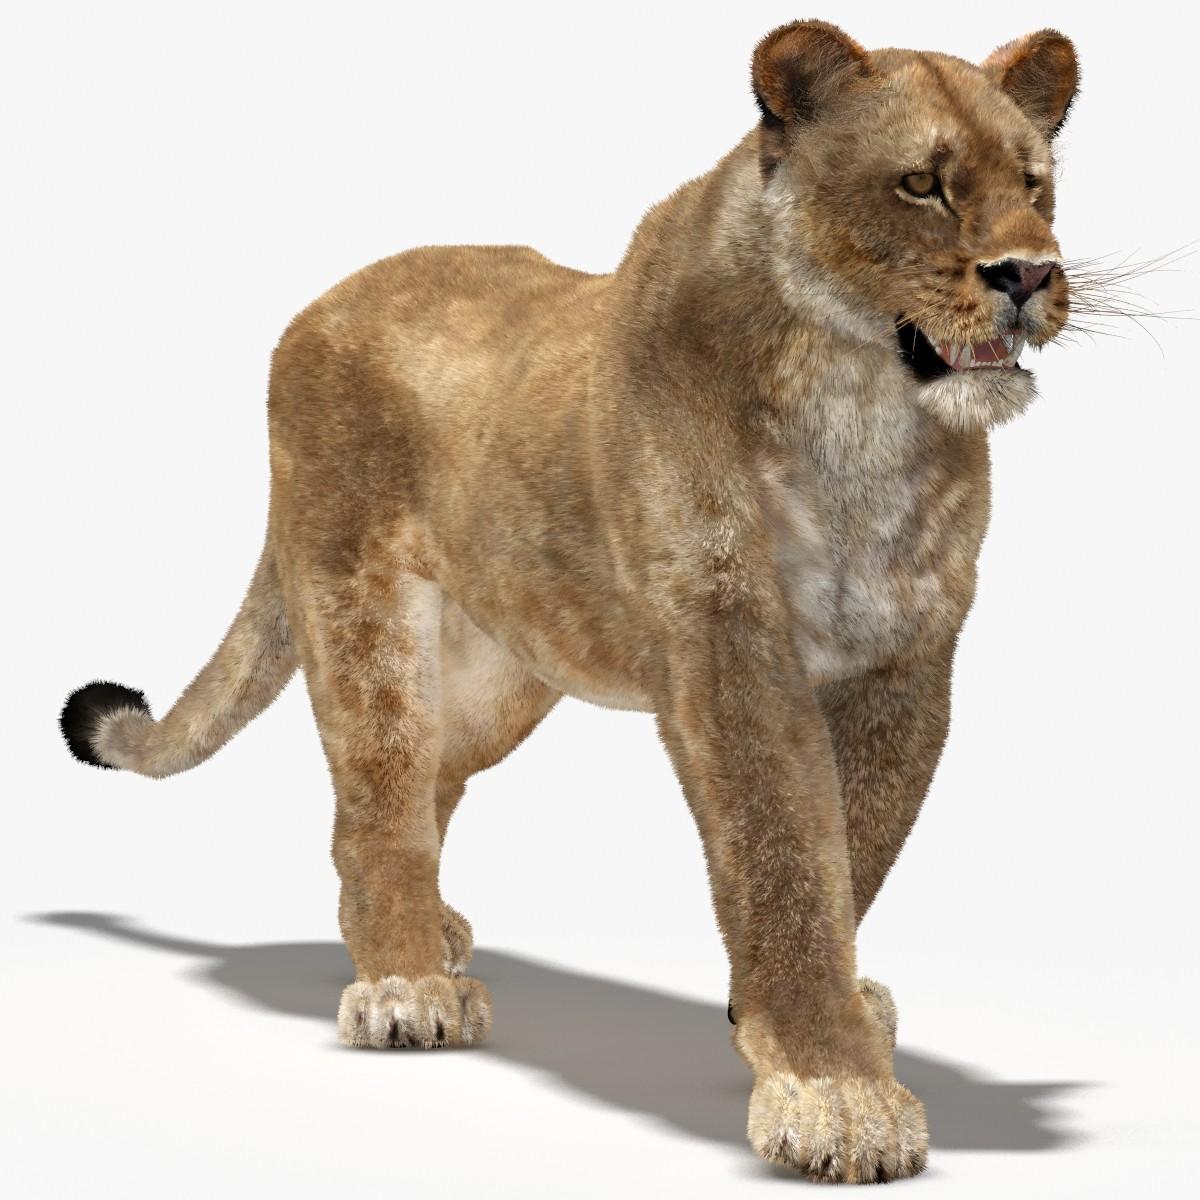 Lioness-00.jpg